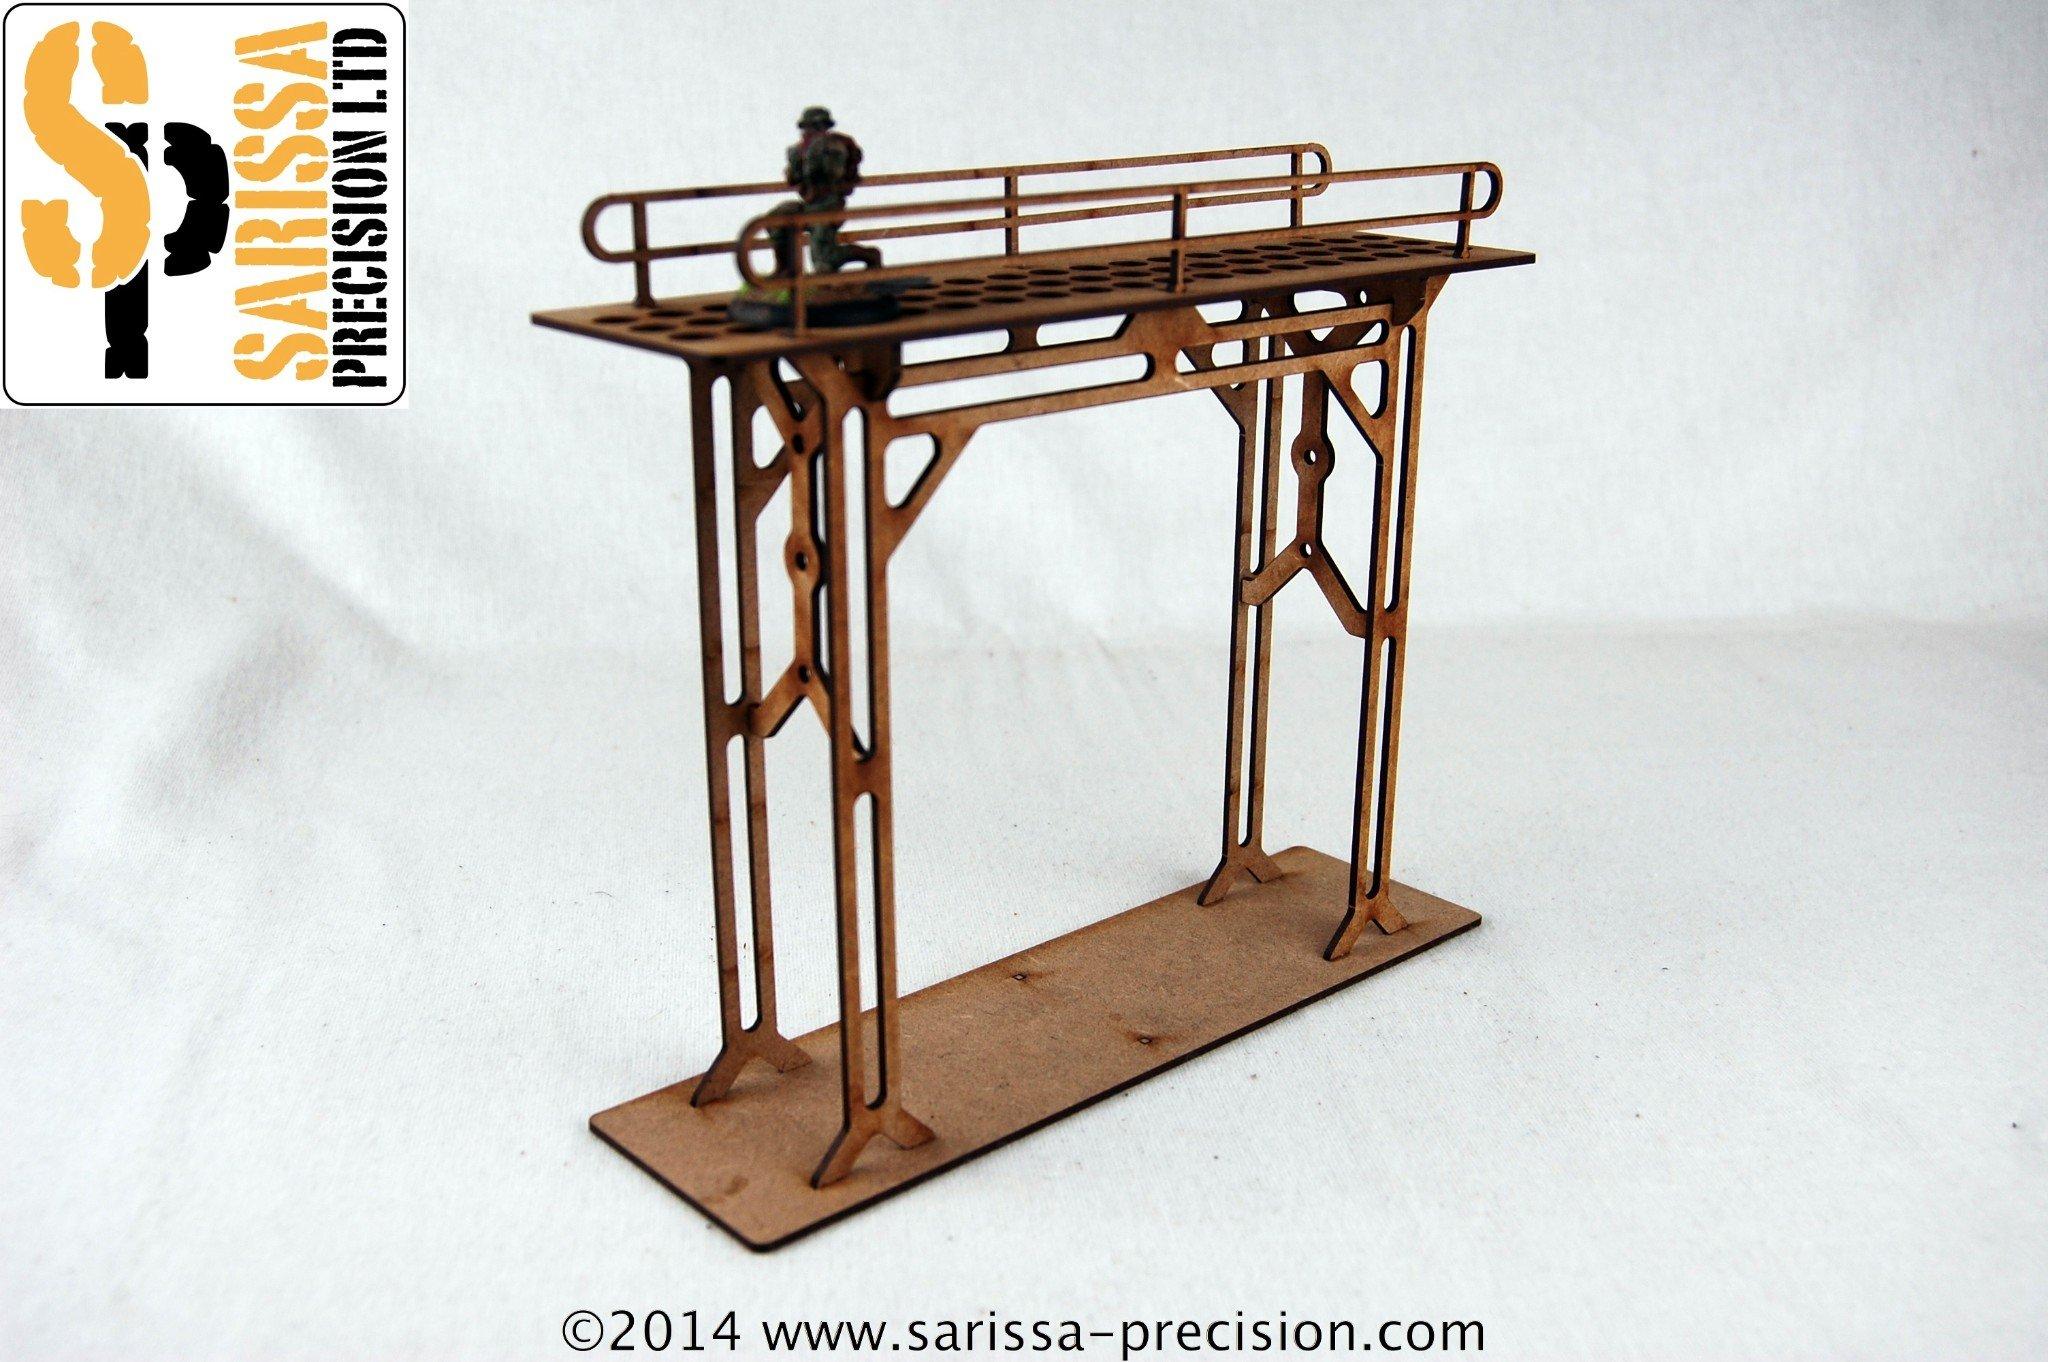 Gantry High Bridge, Sarissa Precision